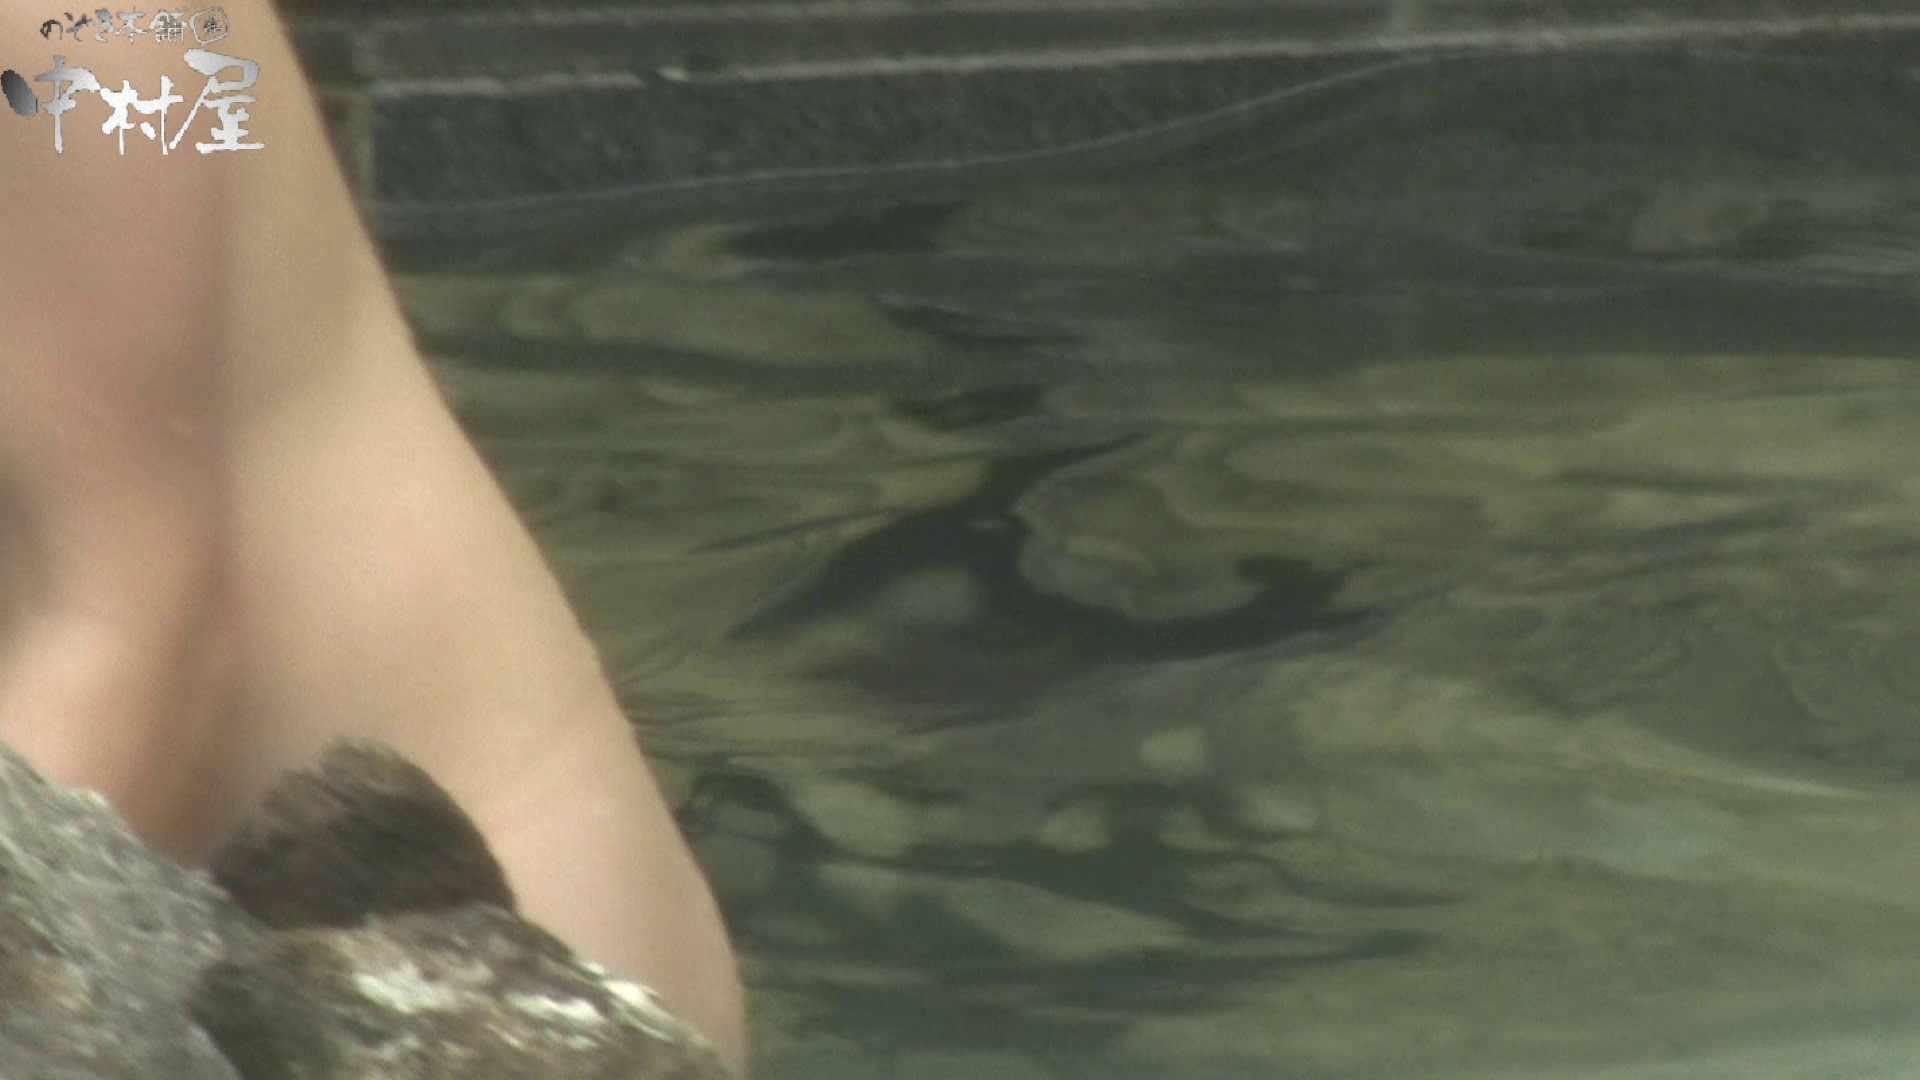 Aquaな露天風呂Vol.905 OLセックス | 露天  71画像 49